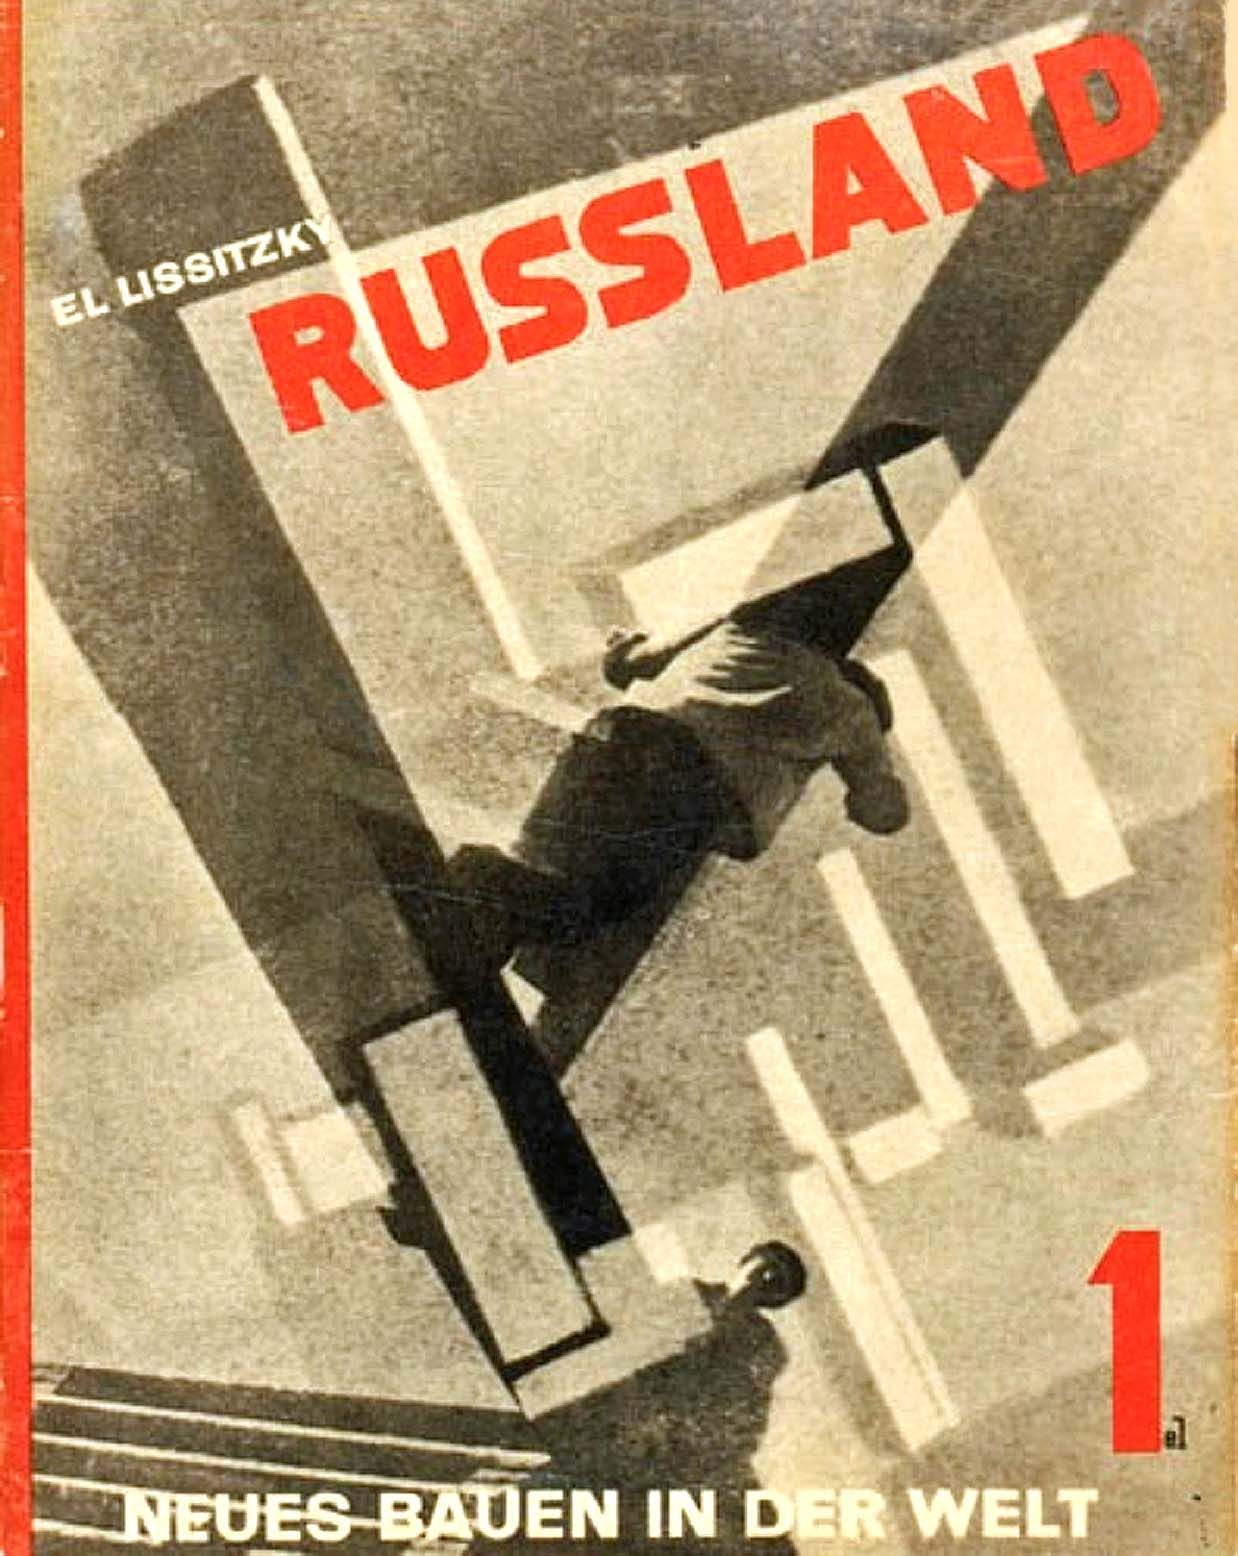 El Lissitzky Graphic design blog, History design, Graphic